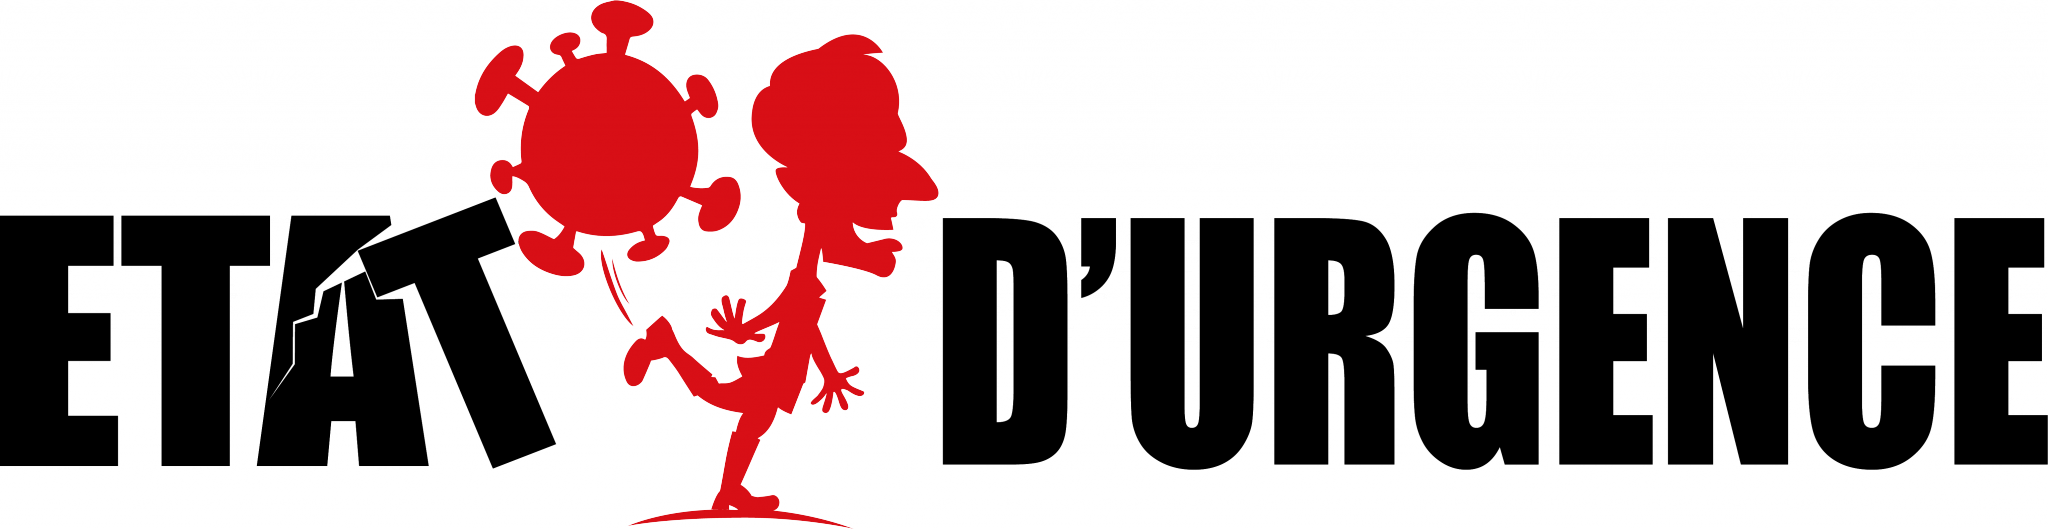 jeremy-ferrari-etat-durgence-le-jeu-logo-fdb